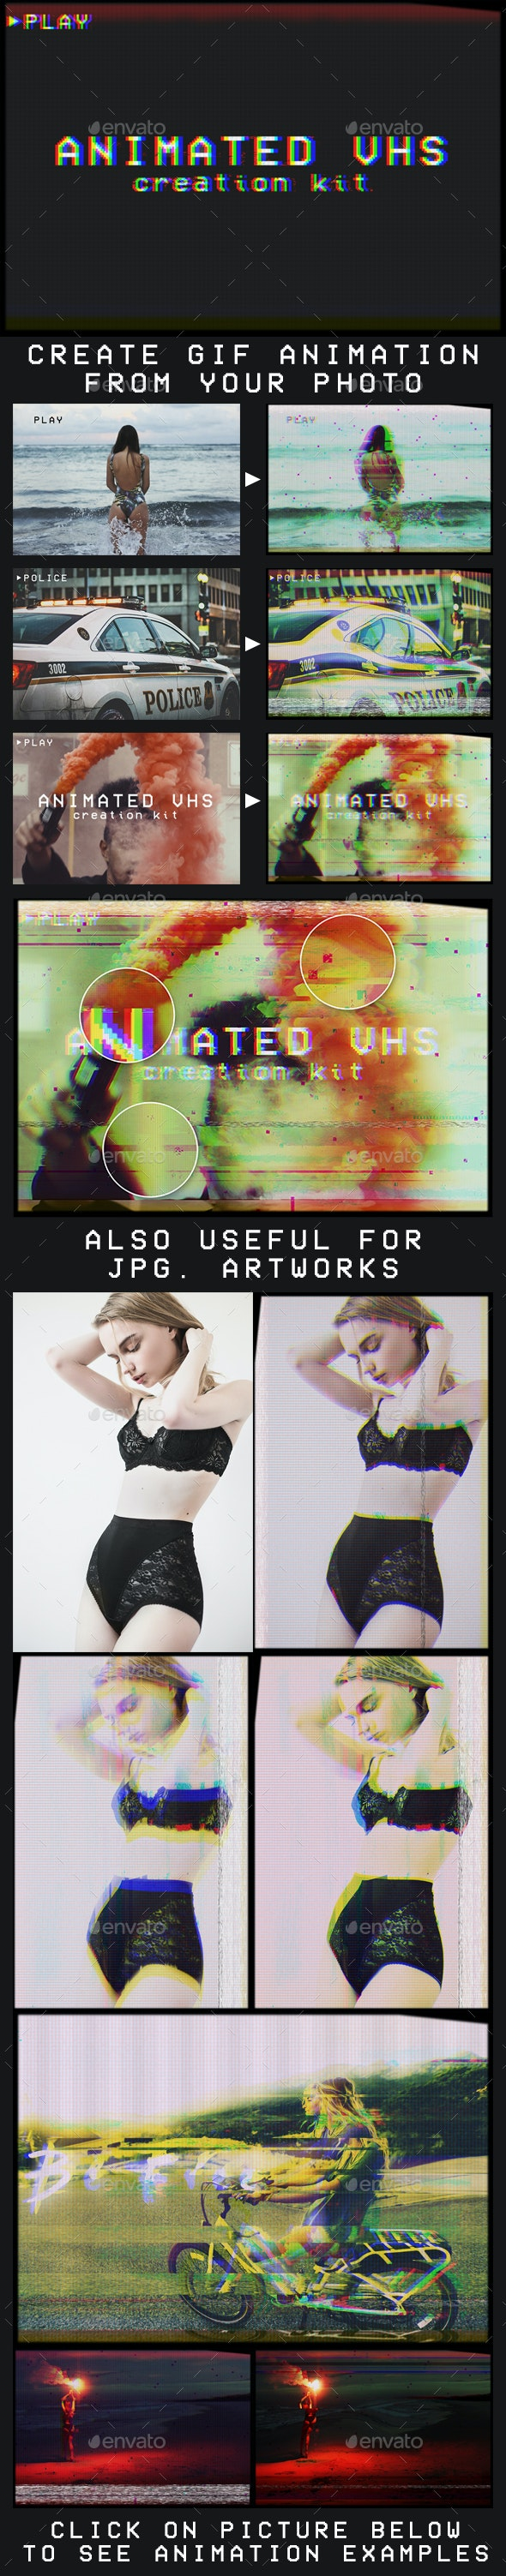 Animated VHS Creation Kit - Artistic Photo Templates